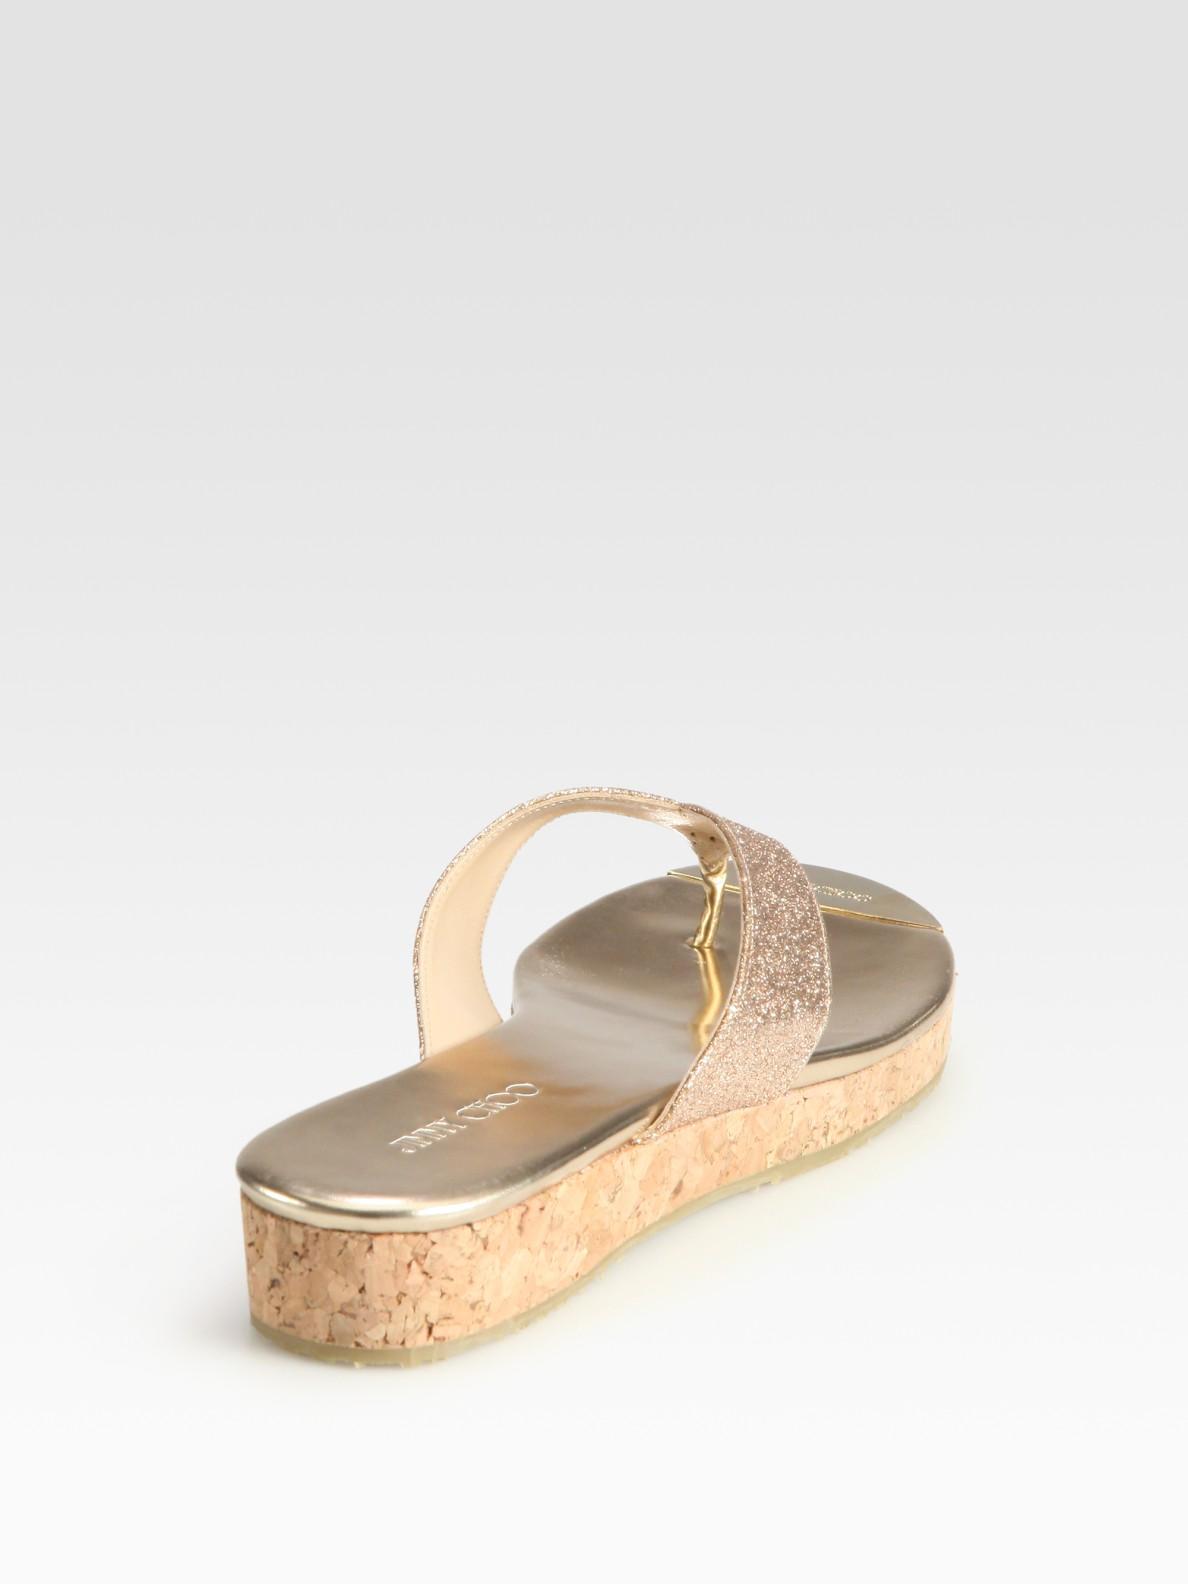 bd578e34042 Lyst - Jimmy Choo Pence Glitter Cork Wedge Sandals in Natural